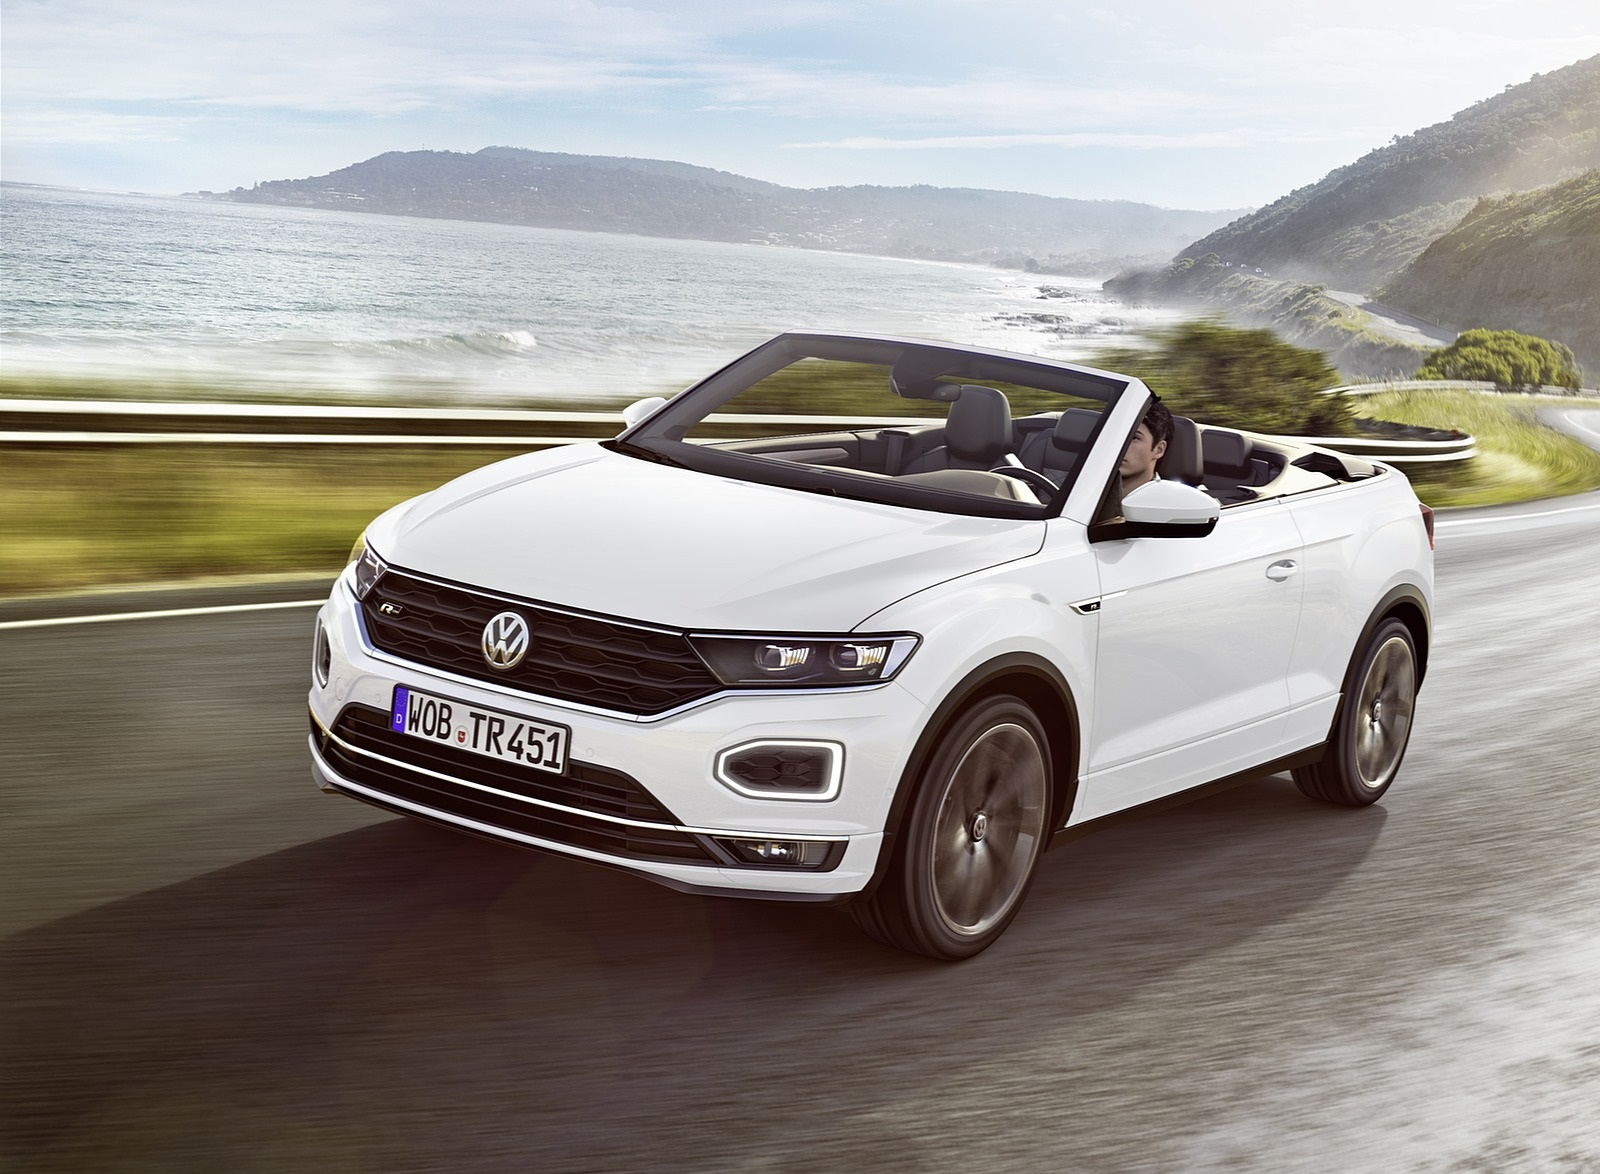 2020 Volkswagen T-Roc Cabriolet Front Three-Quarter Wallpapers (1)